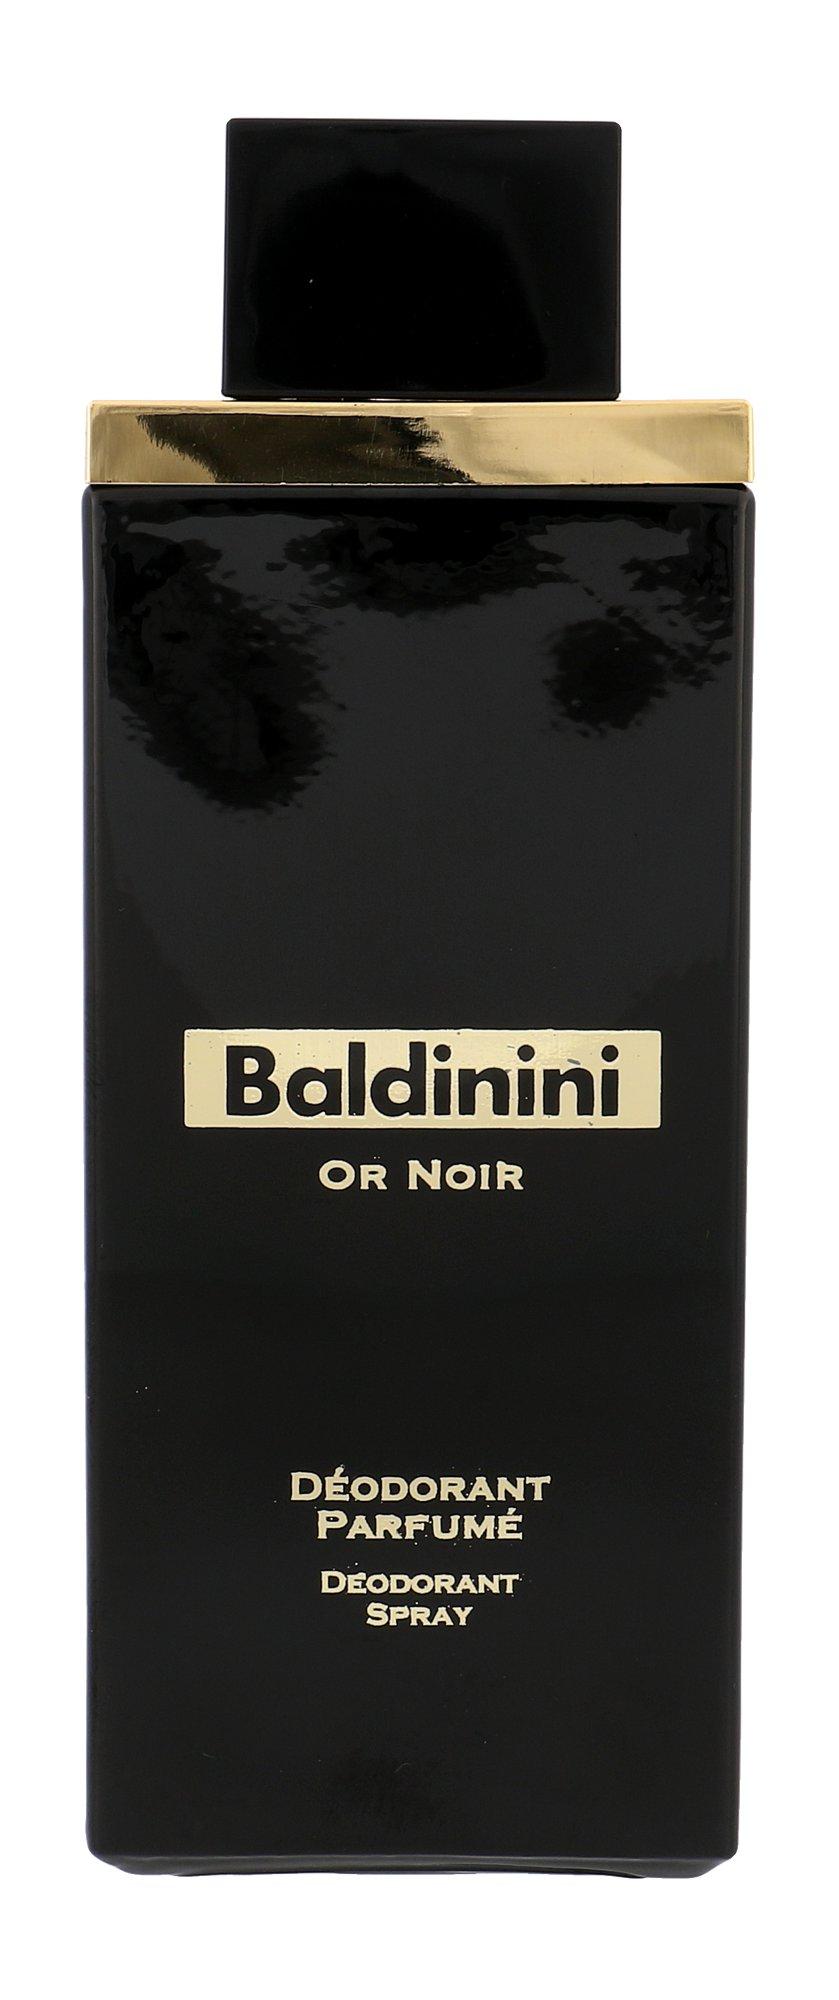 Baldinini Or Noir Deodorant im Spray 100 ml (woman) 91387